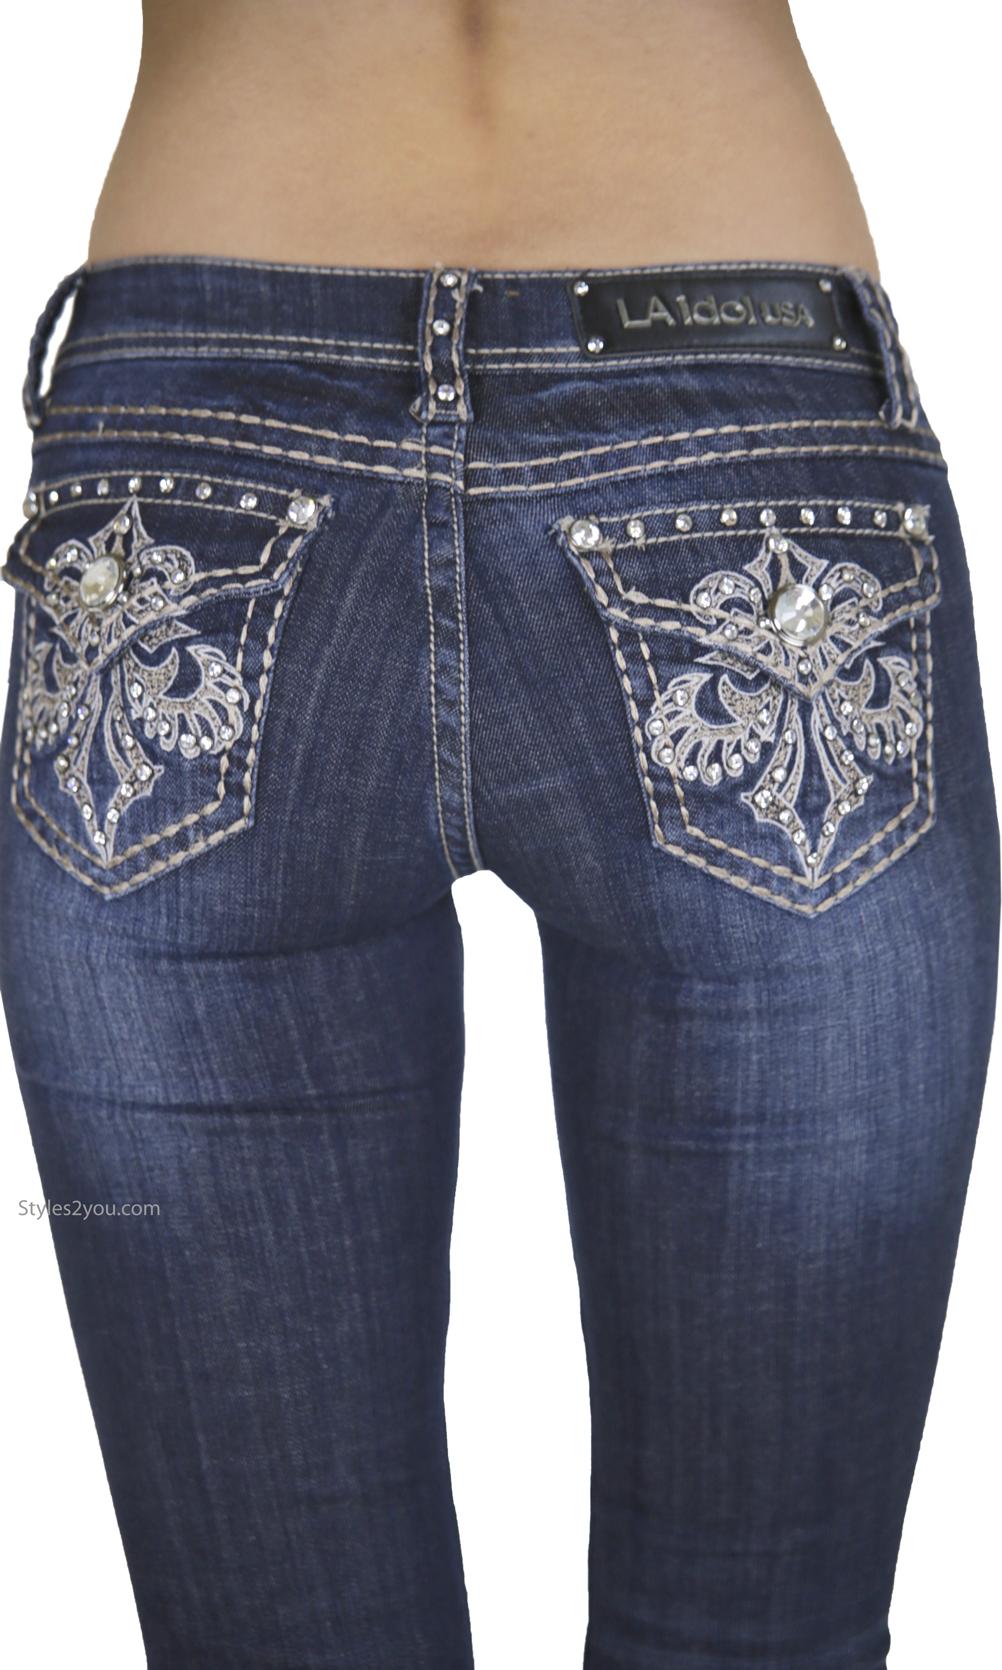 Ladies Rhinestone Embroidered Bootcut Denim Jeans La Idol